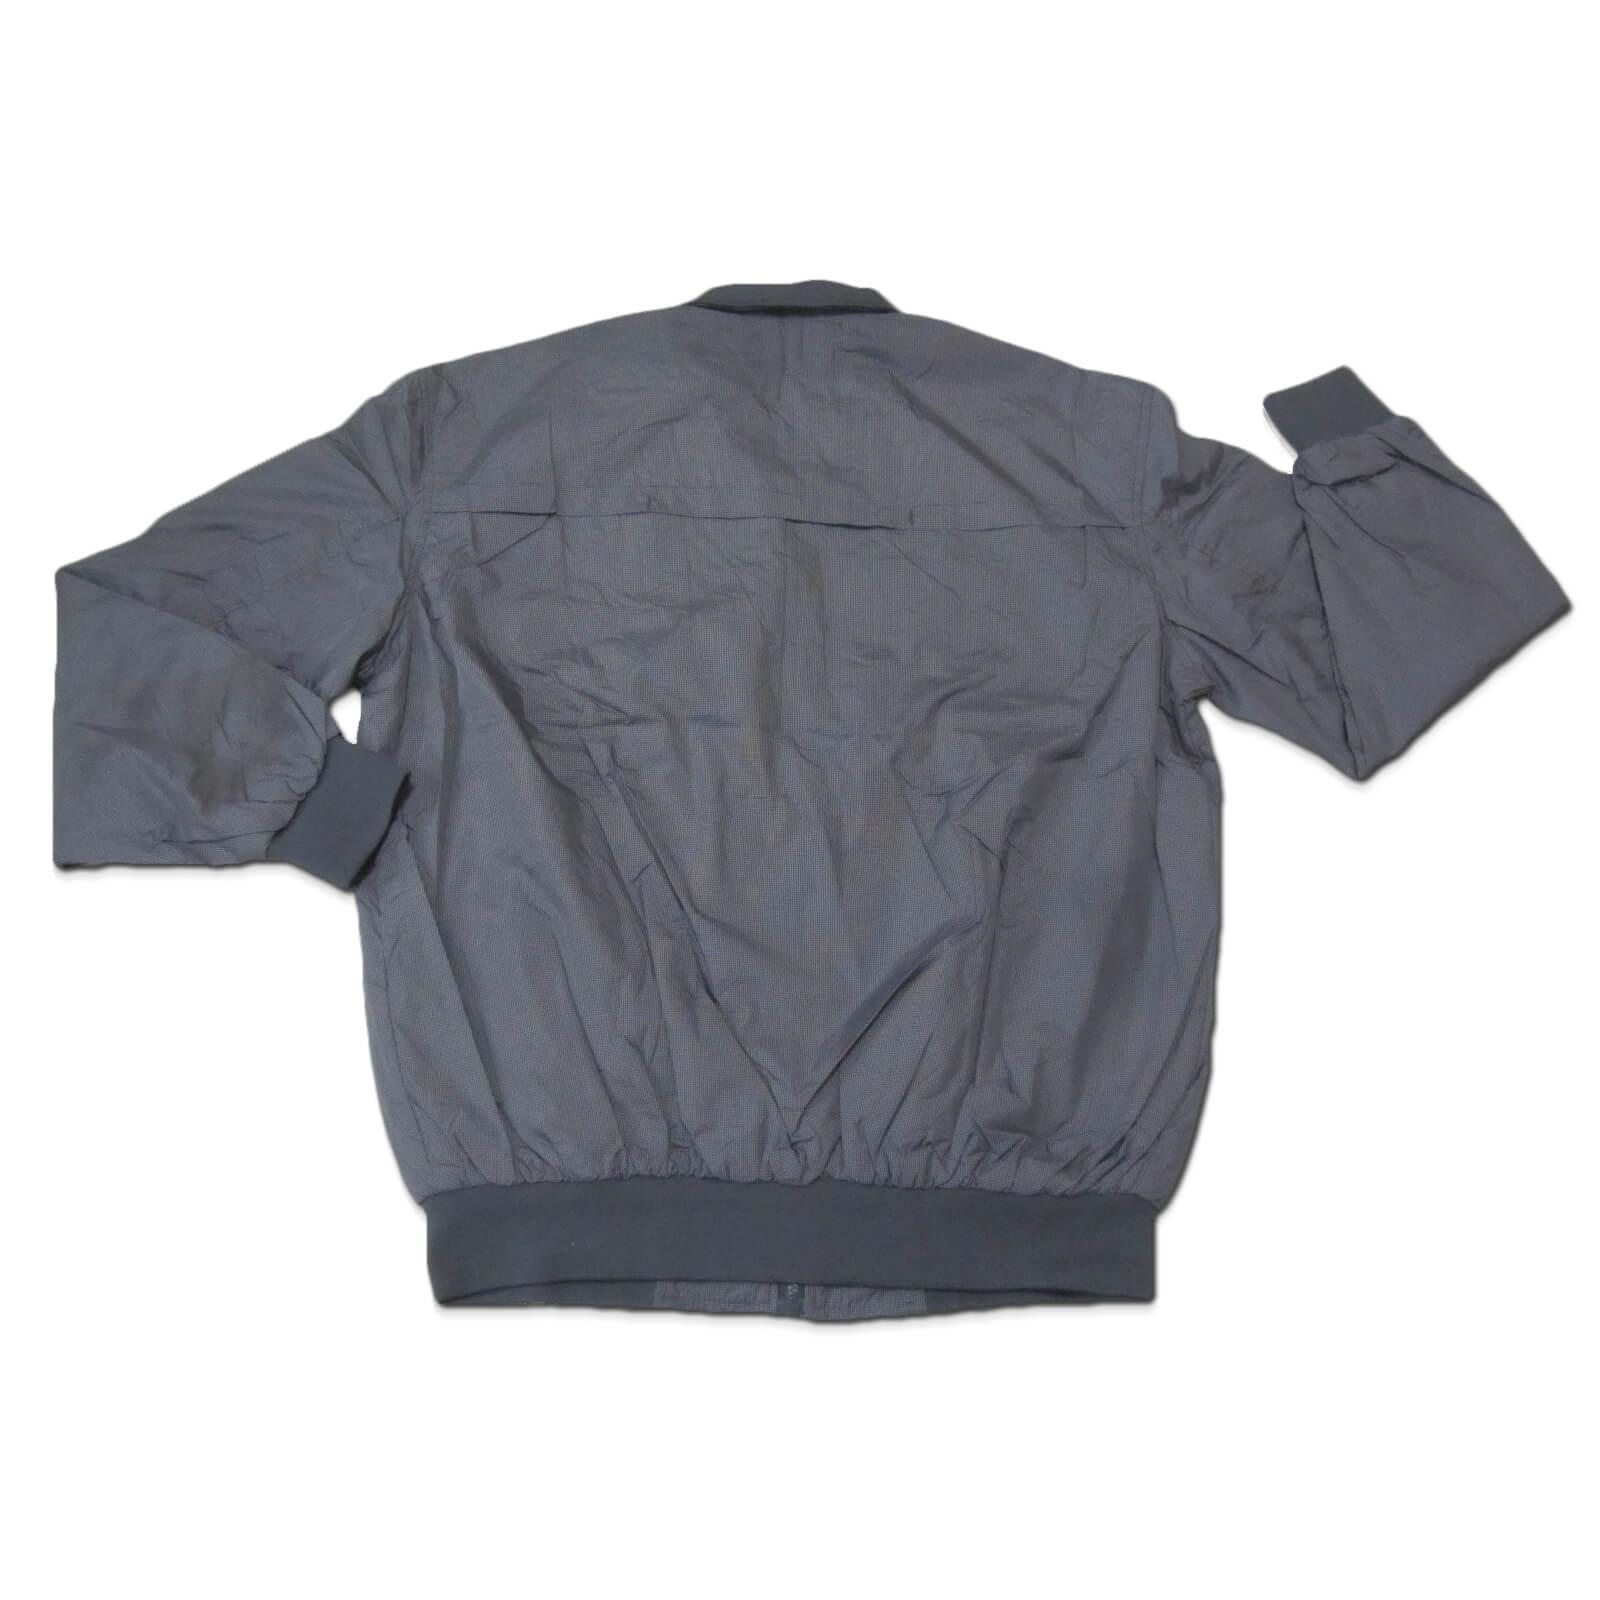 sun-e加大尺碼風衣外套、加大尺碼細格紋外套、加大尺碼夾克外套、加大尺碼防風外套、加大尺碼騎士外套(312-8882-08)藍綠色細格紋、(312-8882-21)灰色細格紋 胸圍:3L 4L(58~60英吋) [實體店面保障] 4